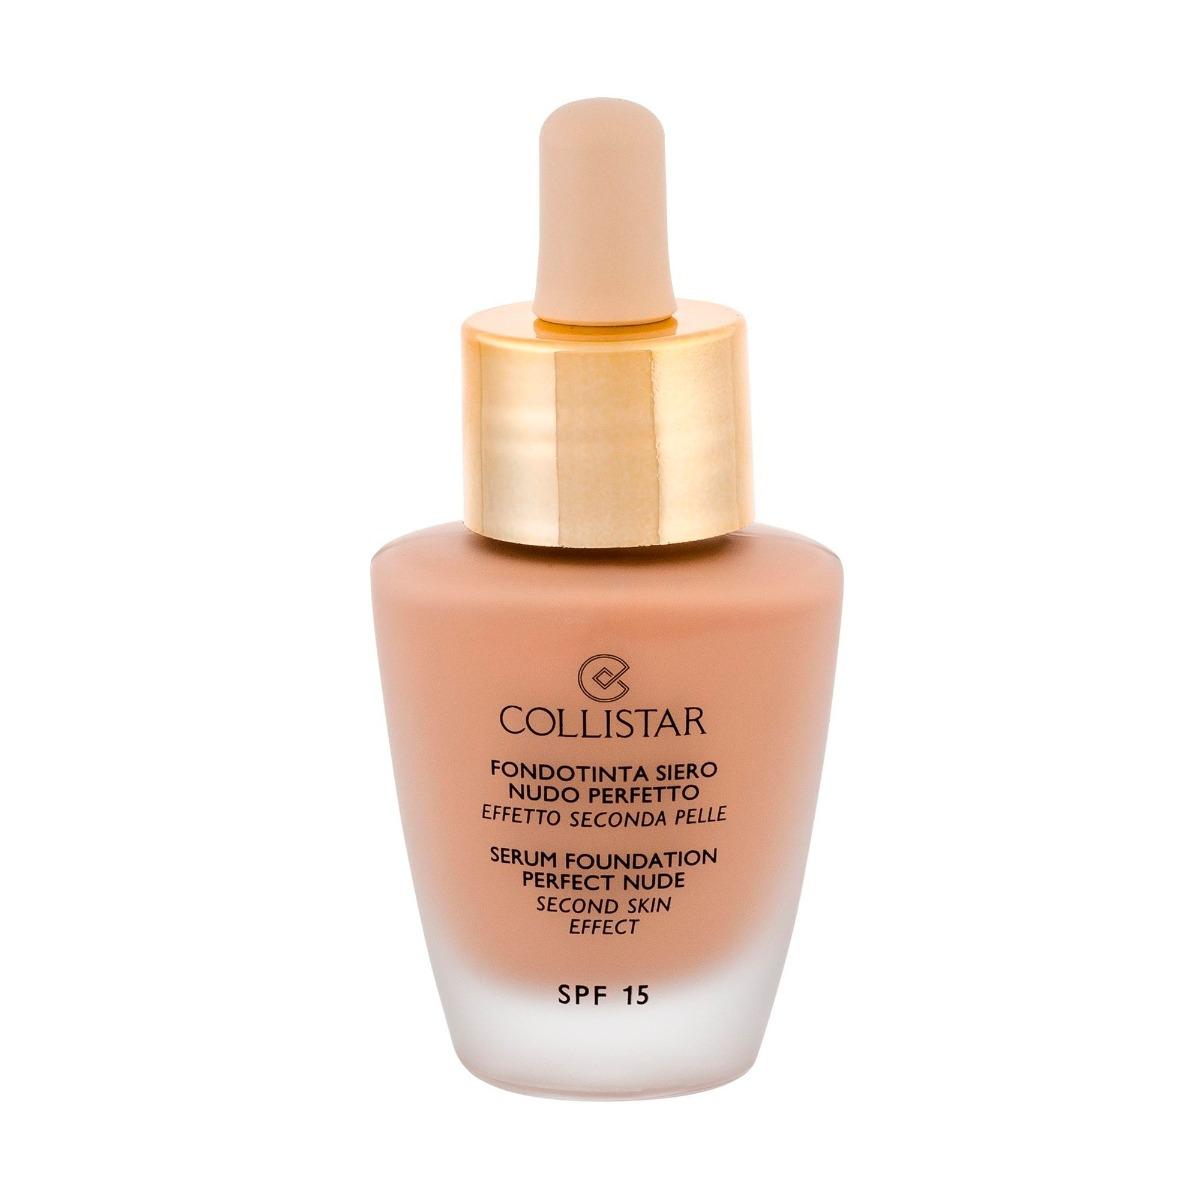 Тональный крем Collistar Serum Foundation Perfect Nude Second Skin Effect SPF 15 3 Nude 30 мл